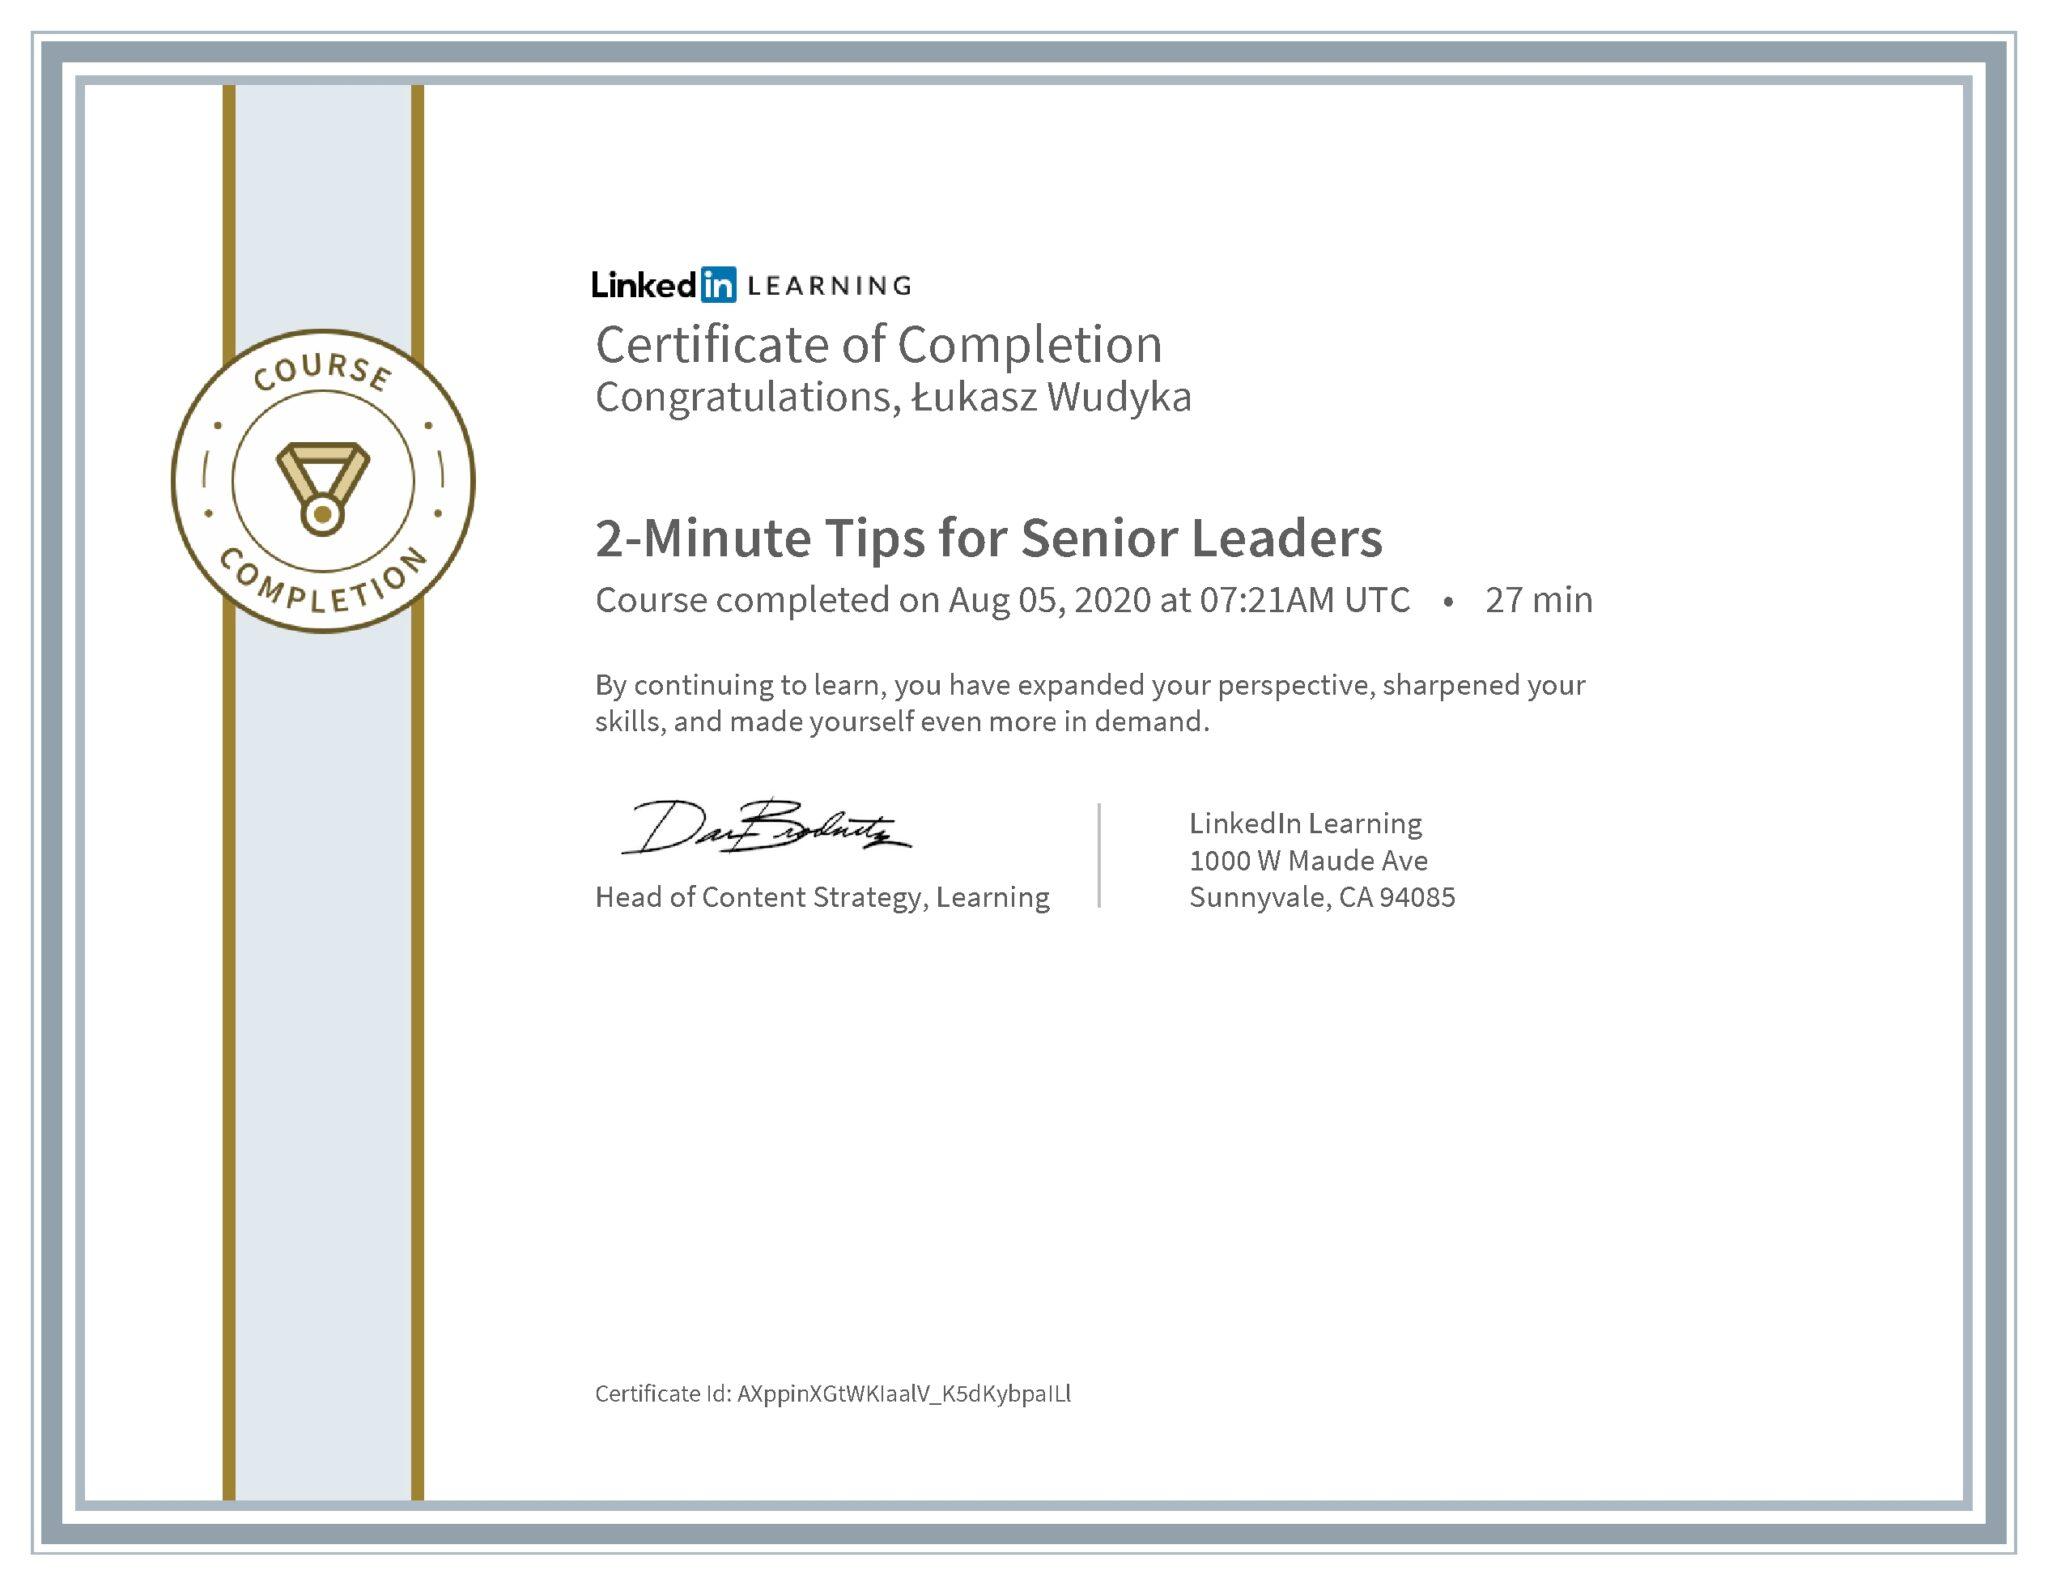 Łukasz Wudyka certyfikat LinkedIn 2-Minute Tips for Senior Leaders